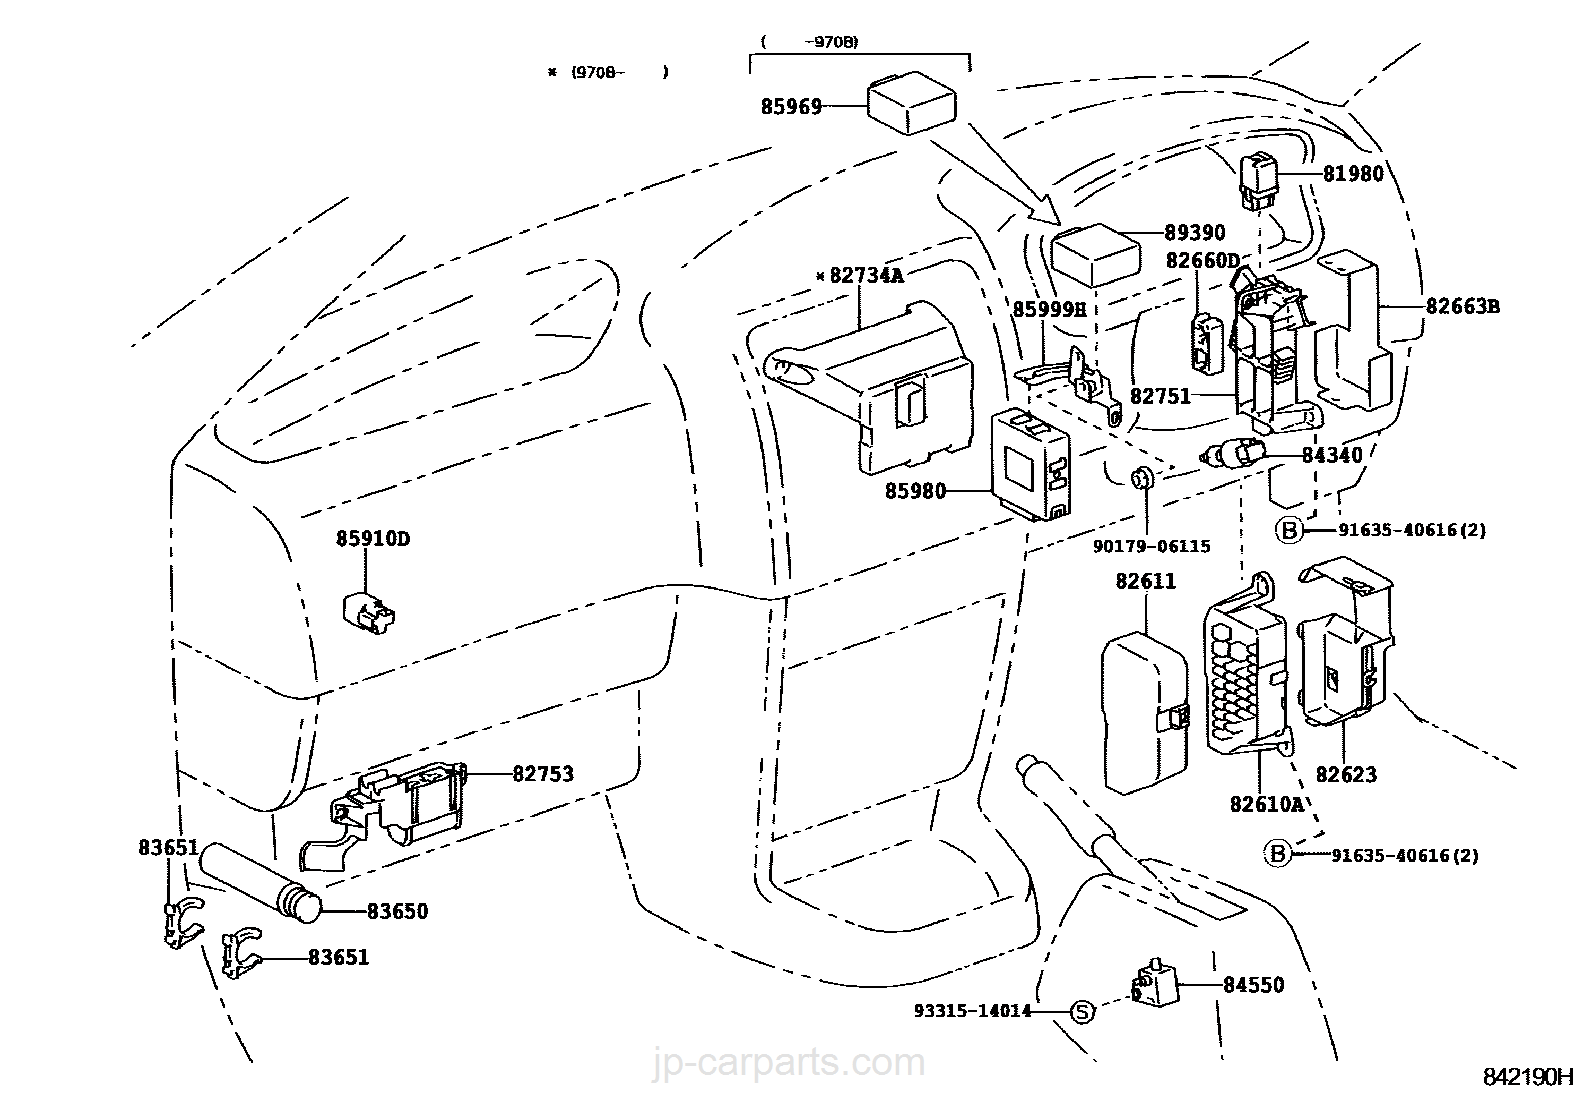 switch relay computer toyota part list jp carparts com rh jp carparts com 1995 toyota hiace fuse box diagram 2008 toyota hiace fuse box diagram